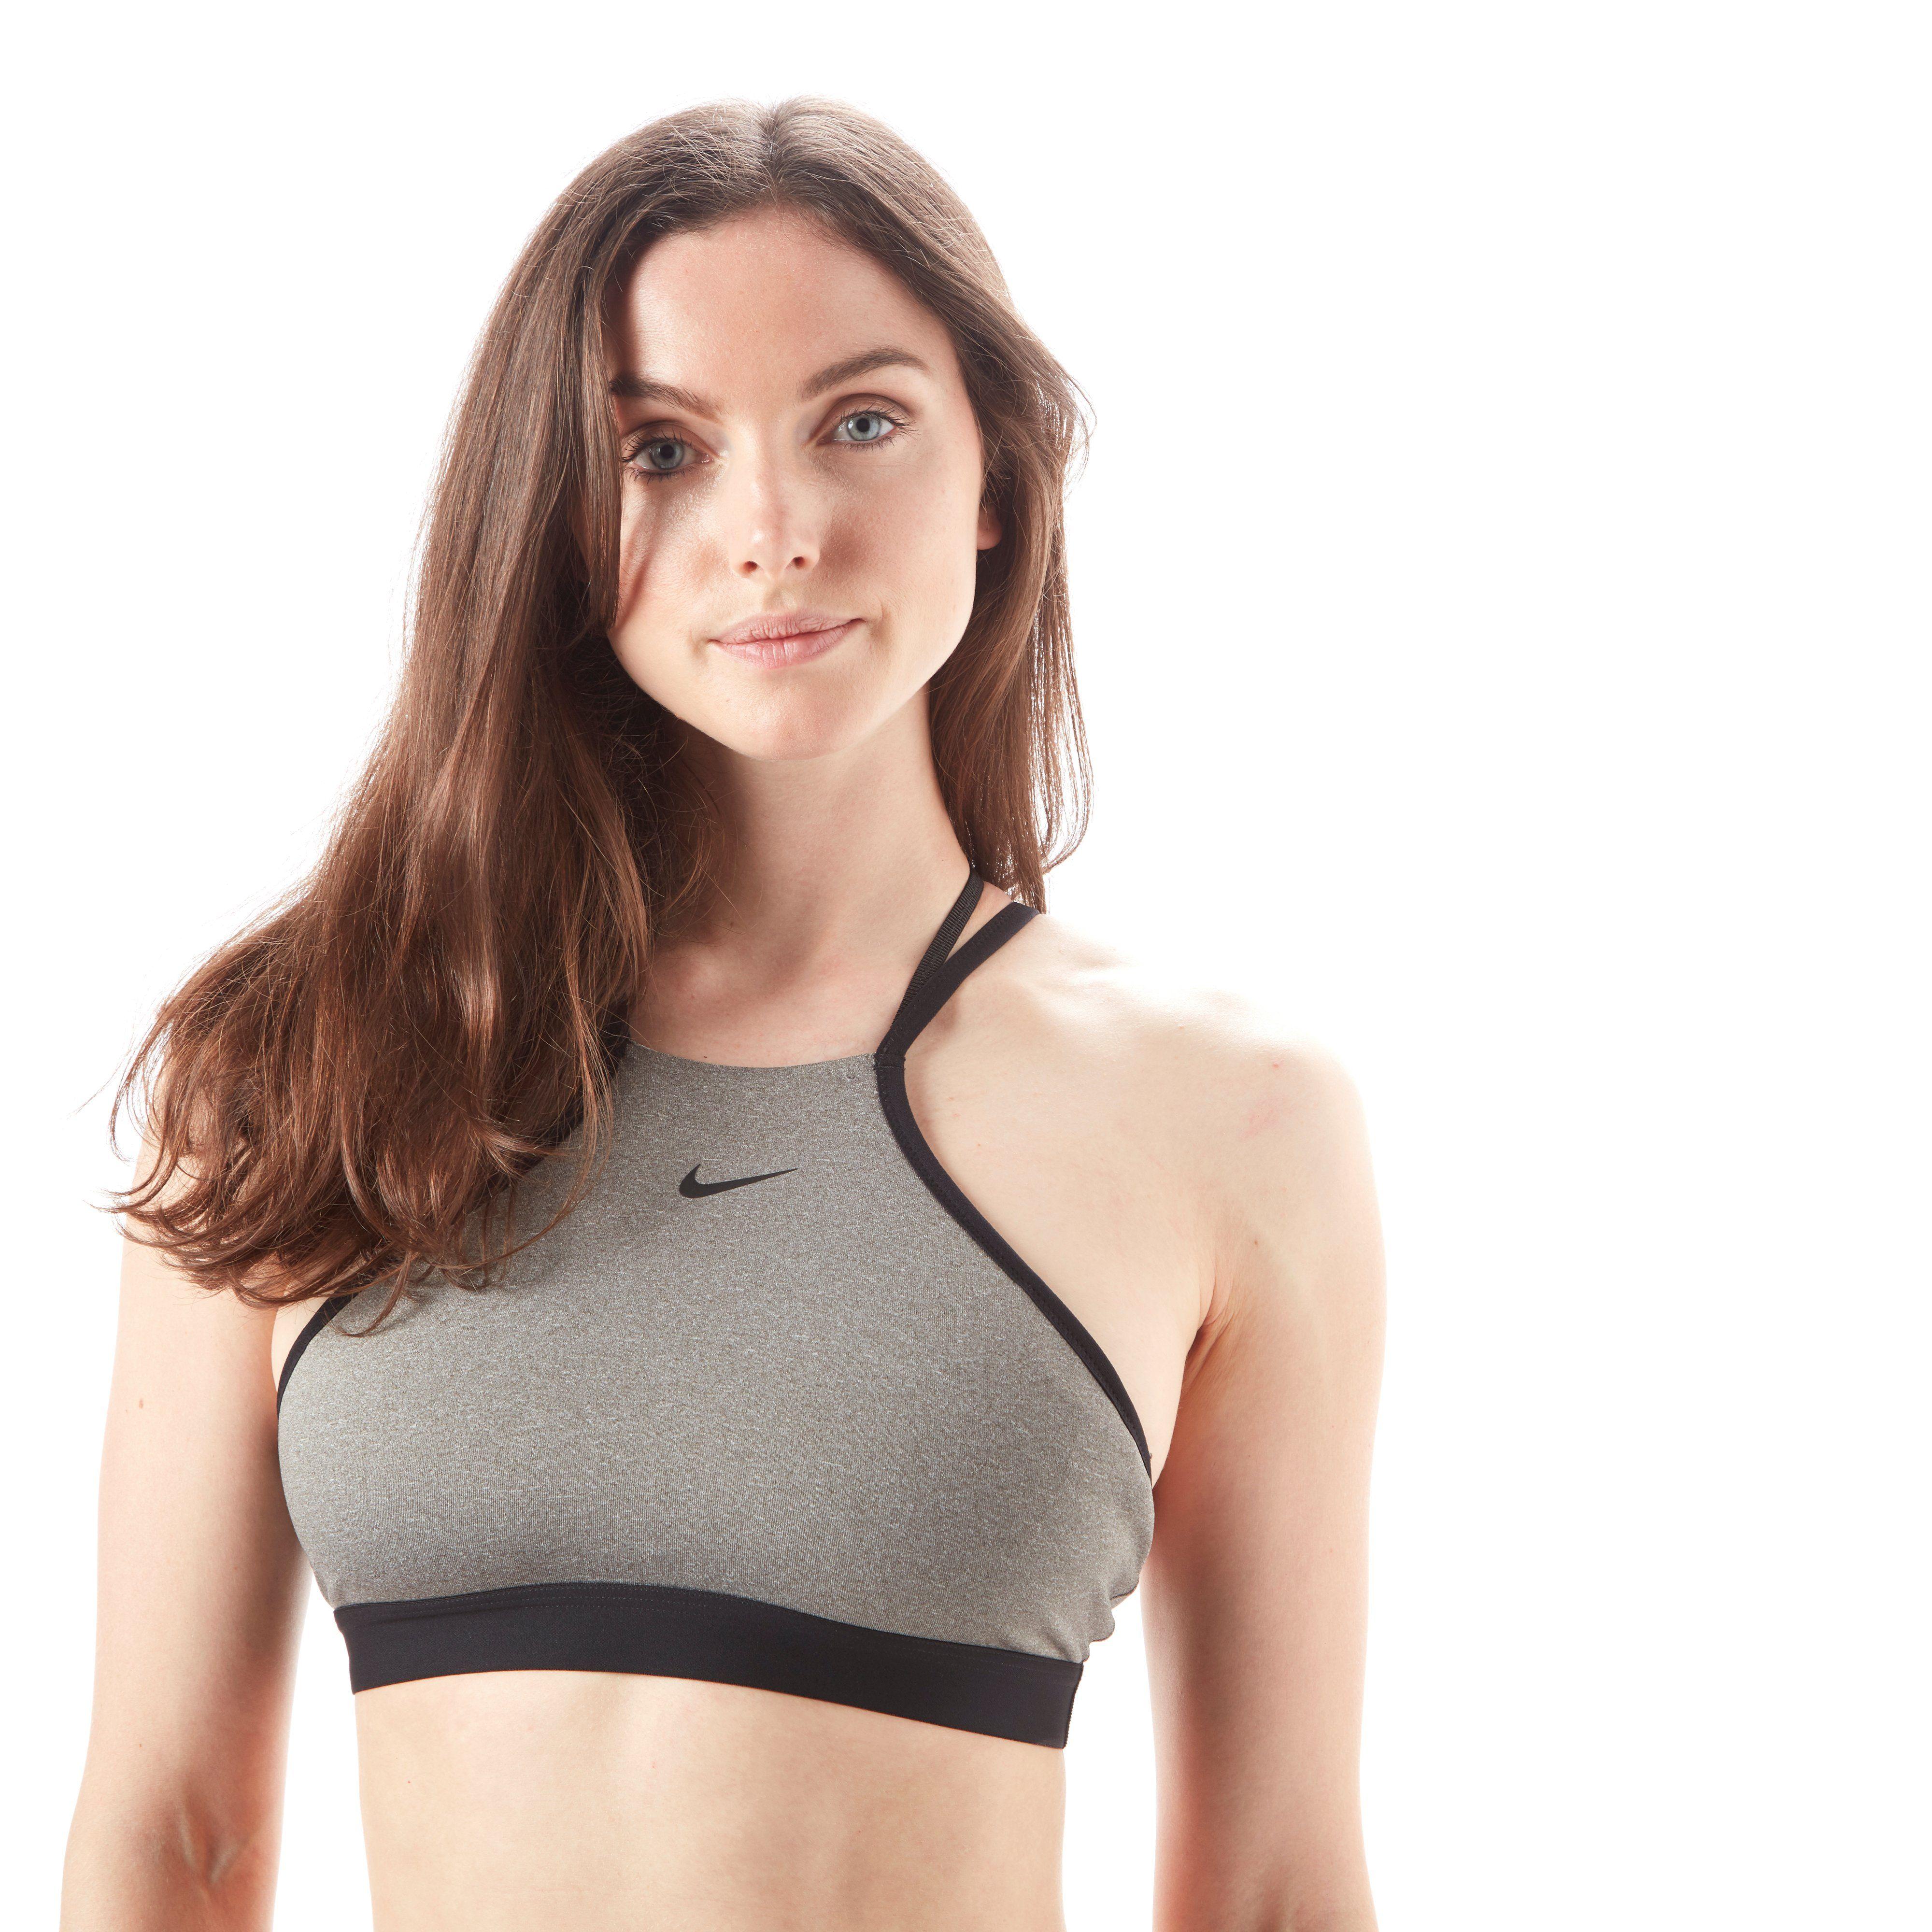 Nike Indy Modern Women's Training Bra